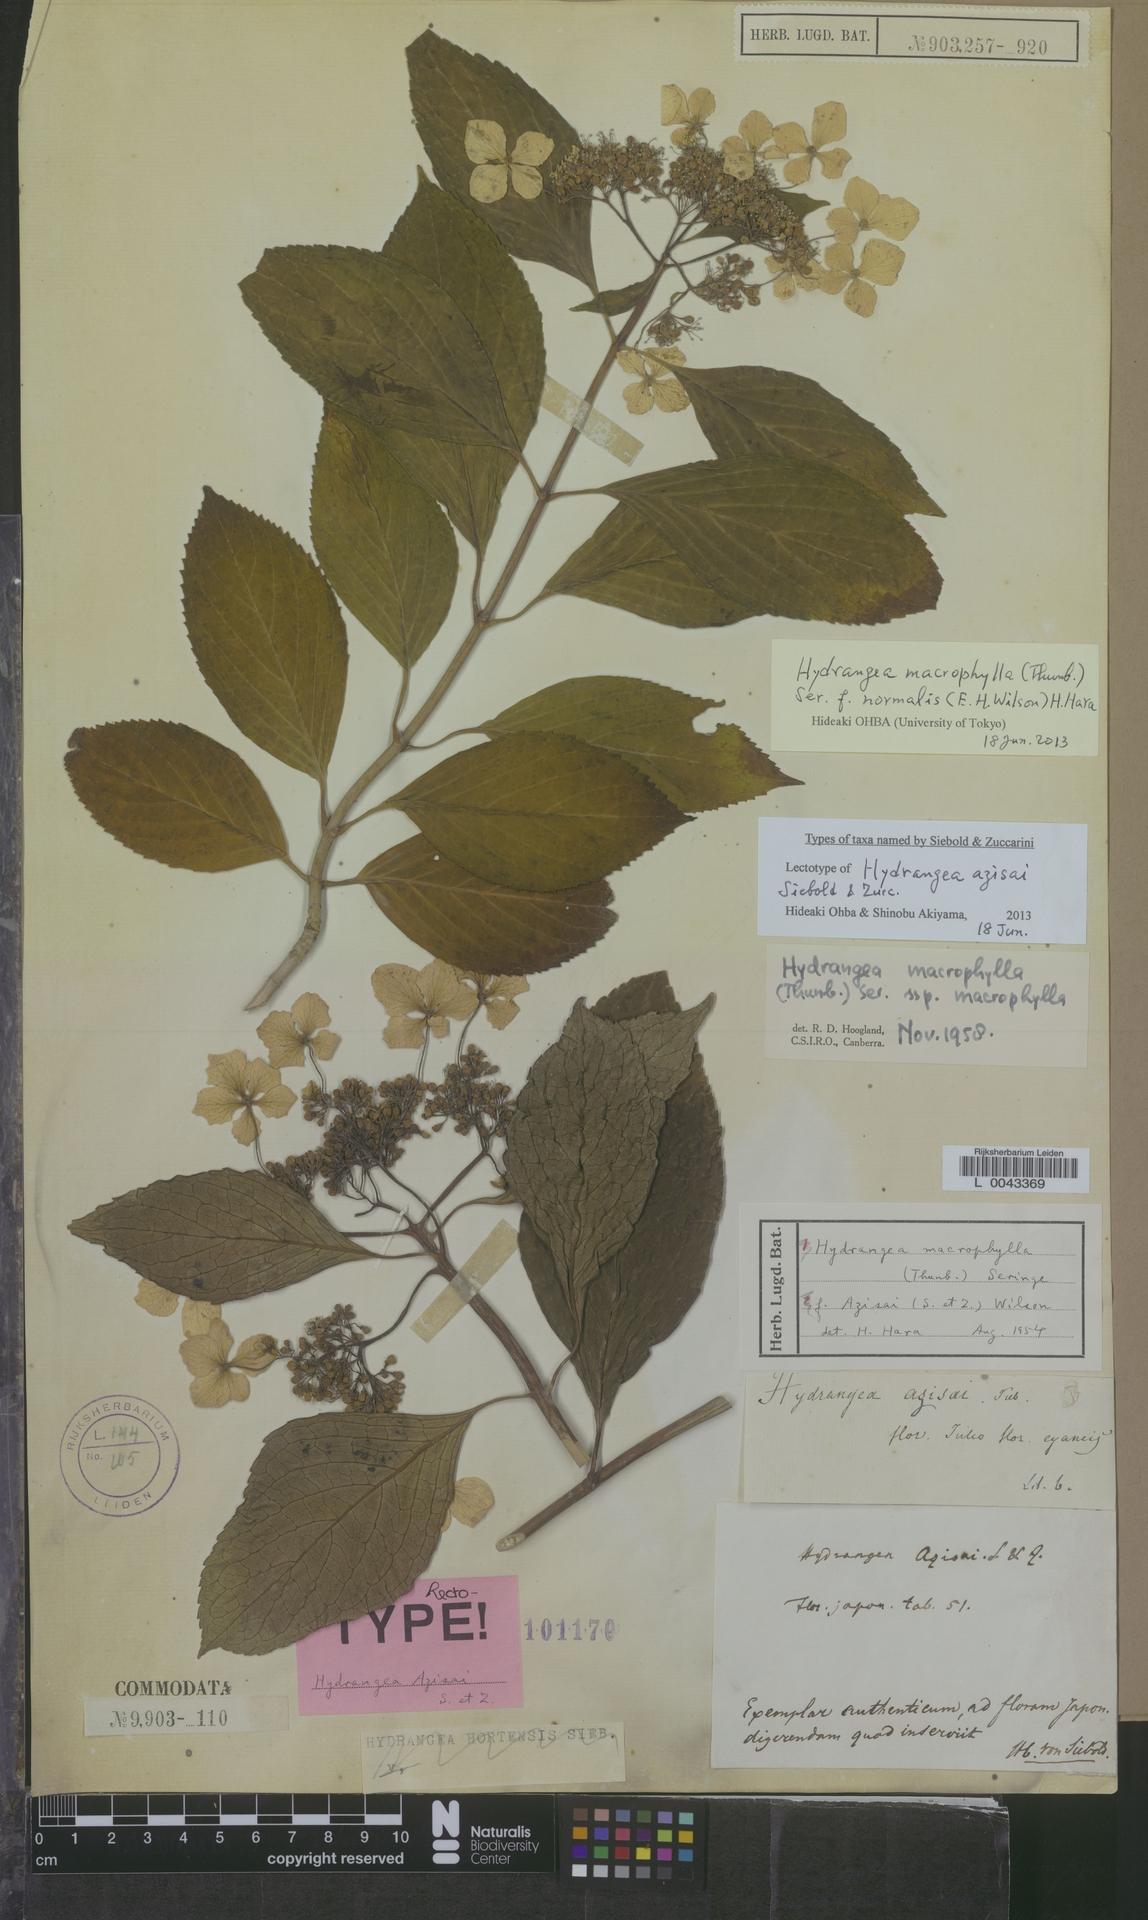 L  0043369 | Hydrangea macrophylla f. normalis